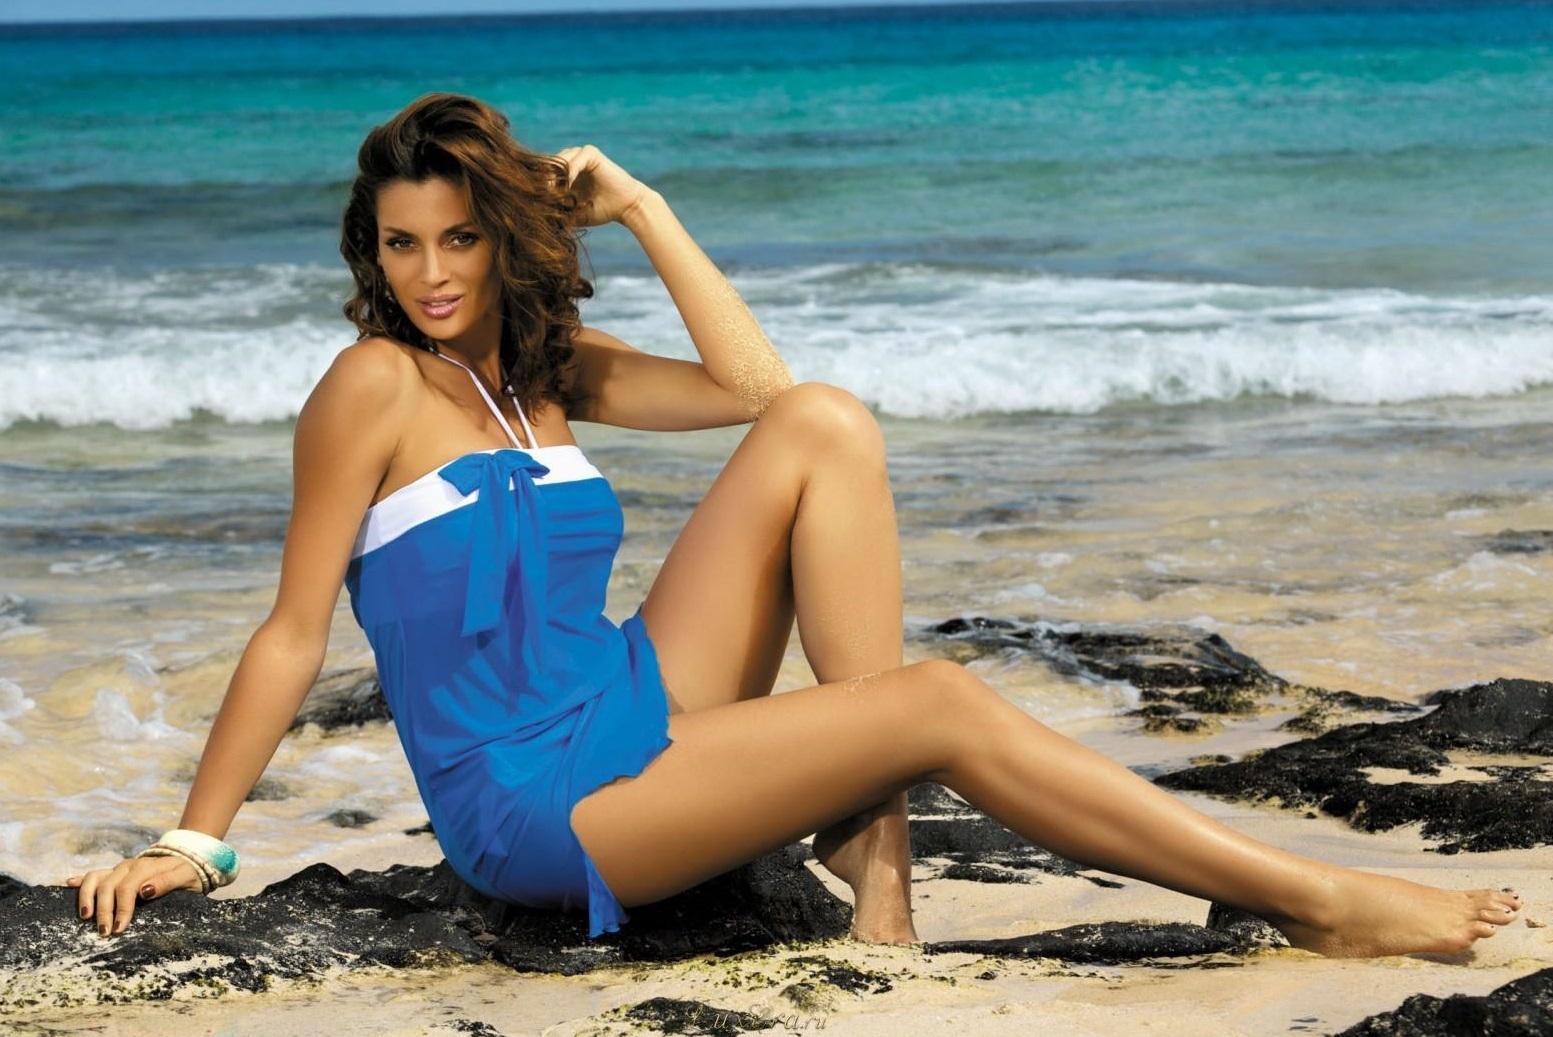 Фото девушки фитнес на пляже 14 фотография